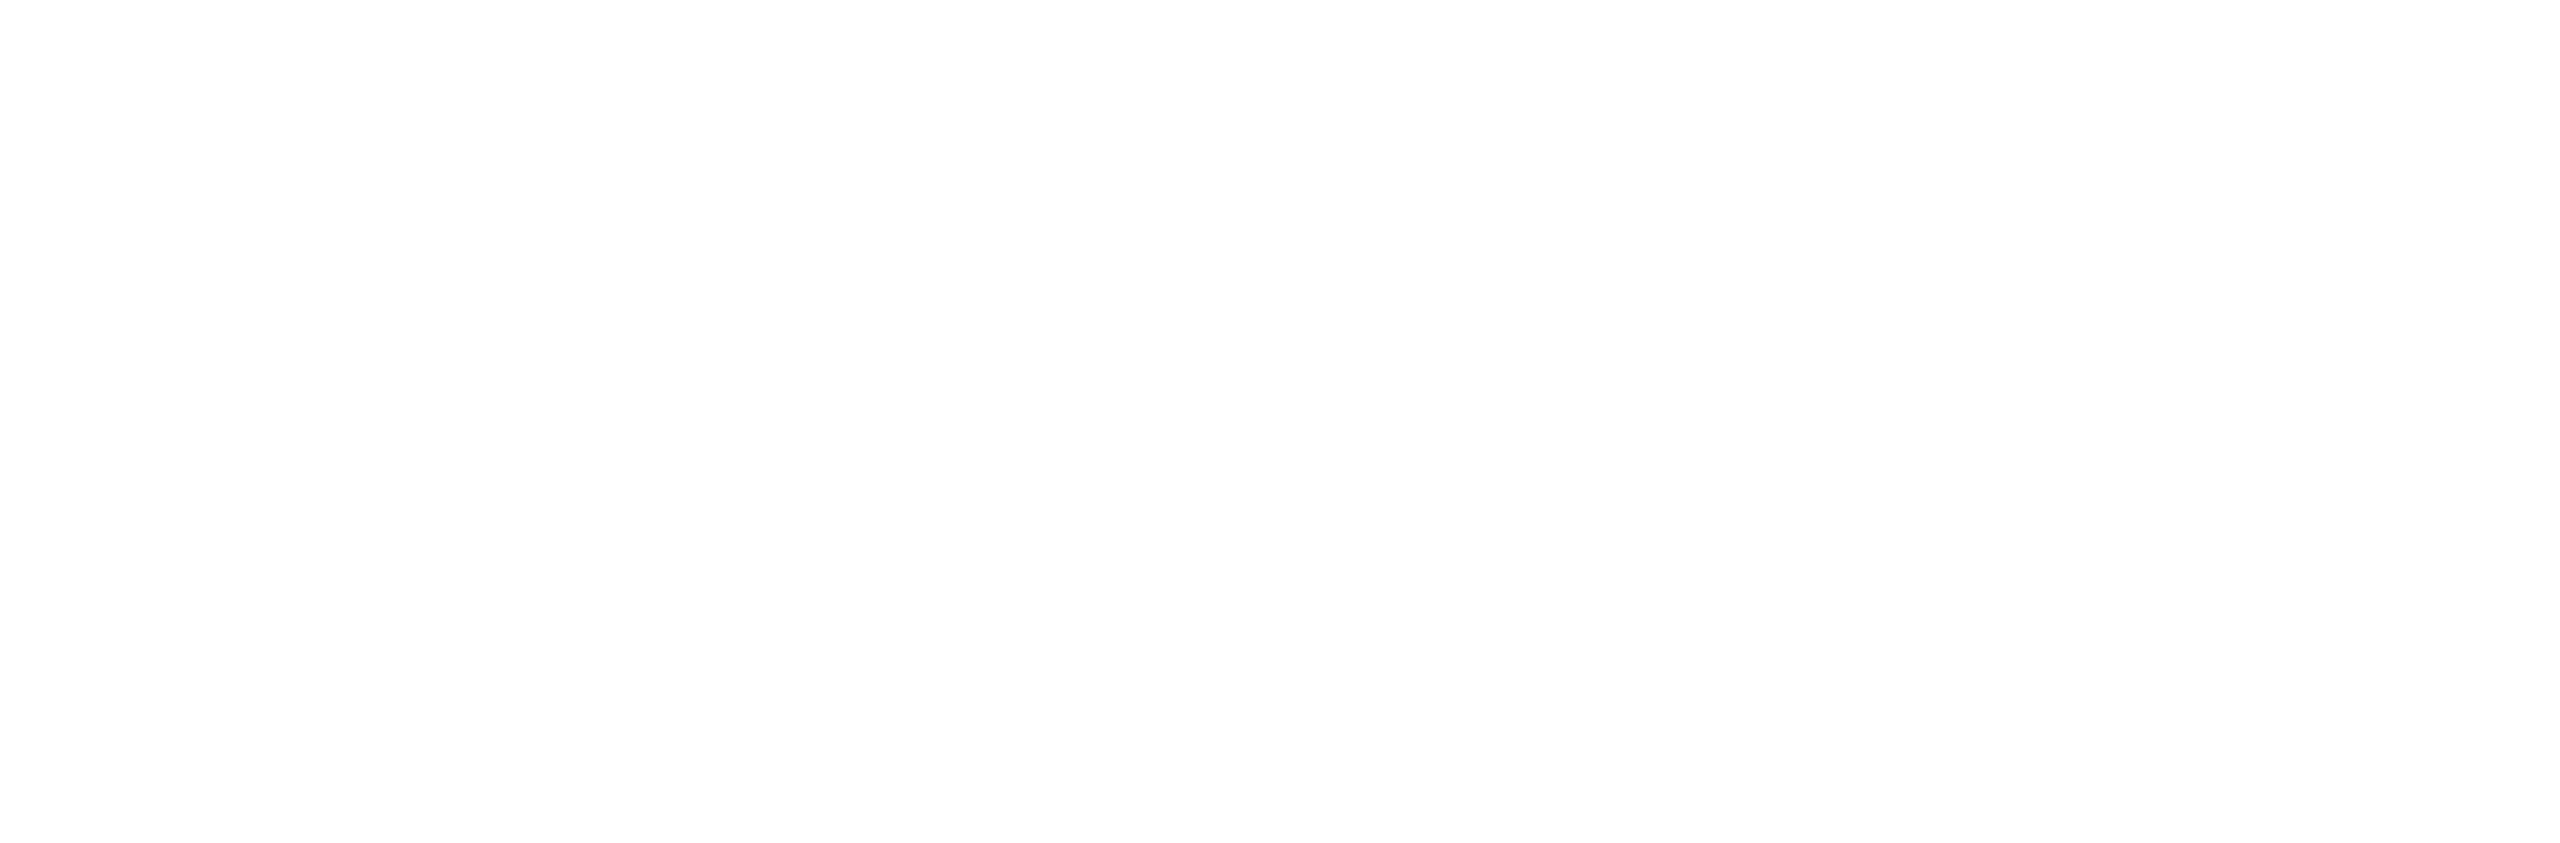 PT. Rinjani Warna Karya